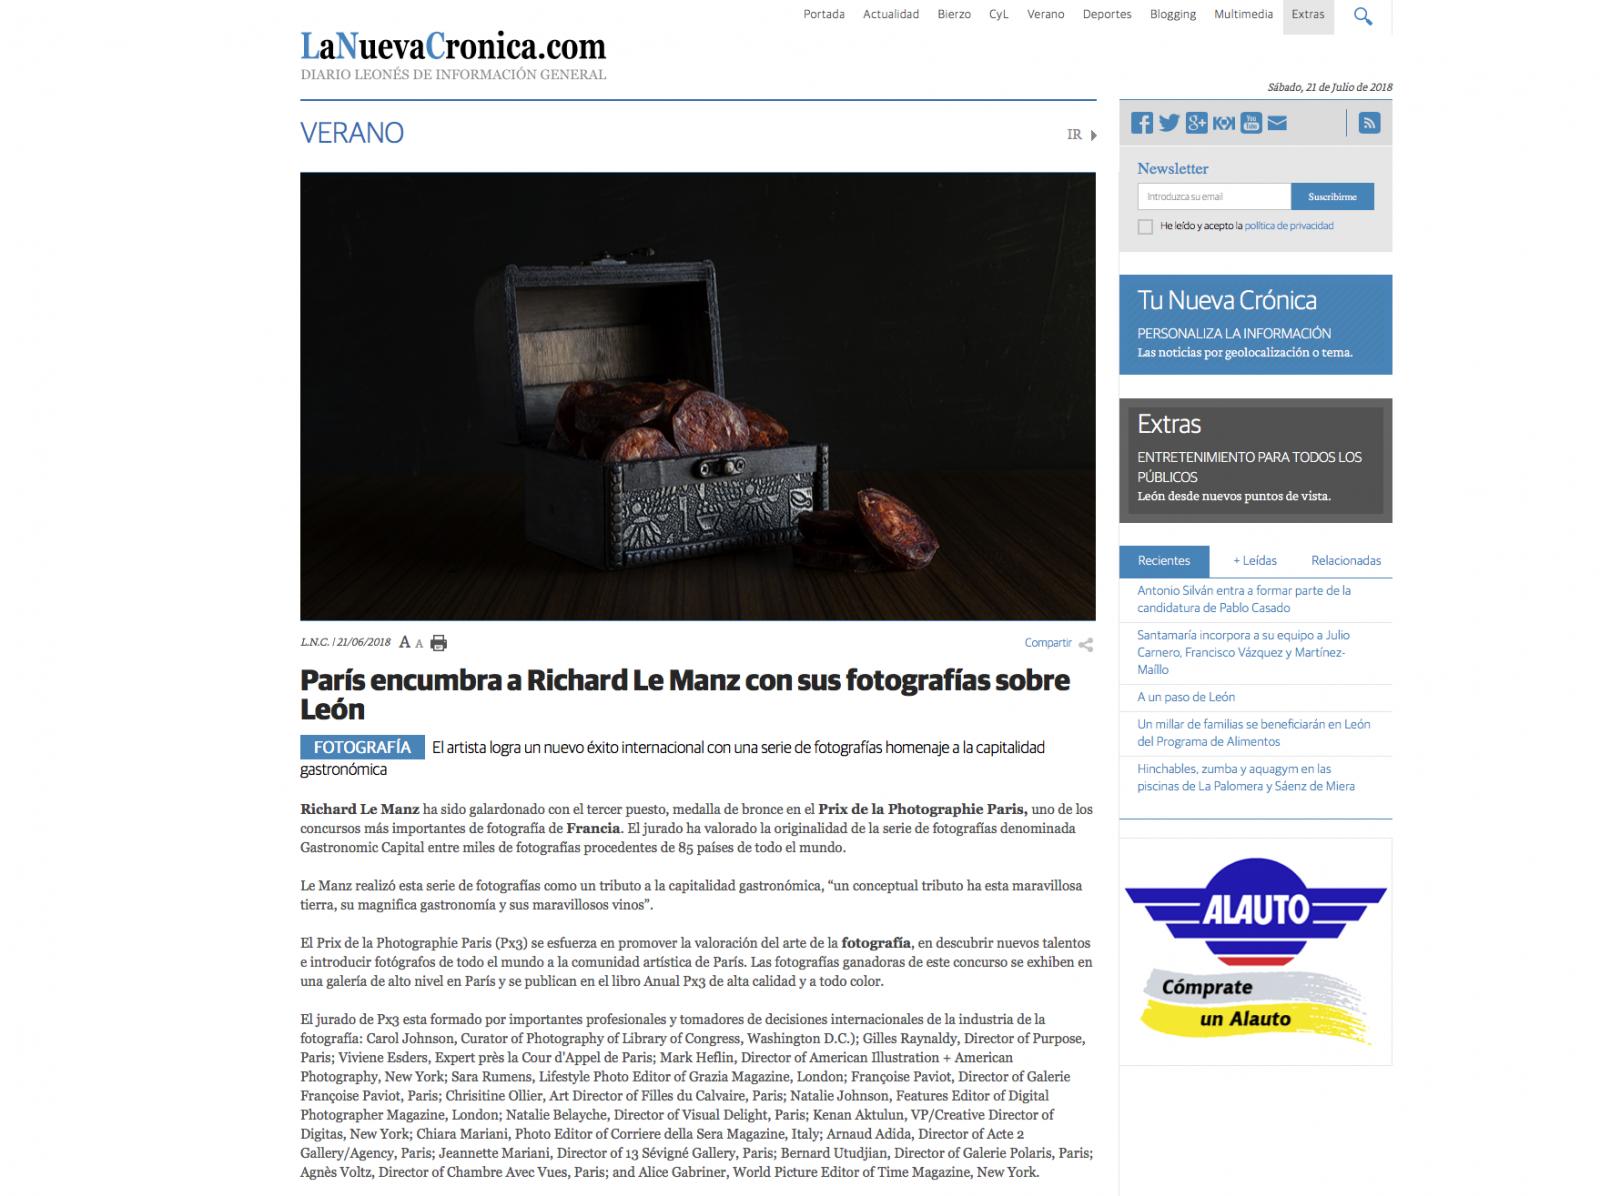 Photography image - Loading Captura_de_pantalla_2018-07-21_a_las_11.51.51.png